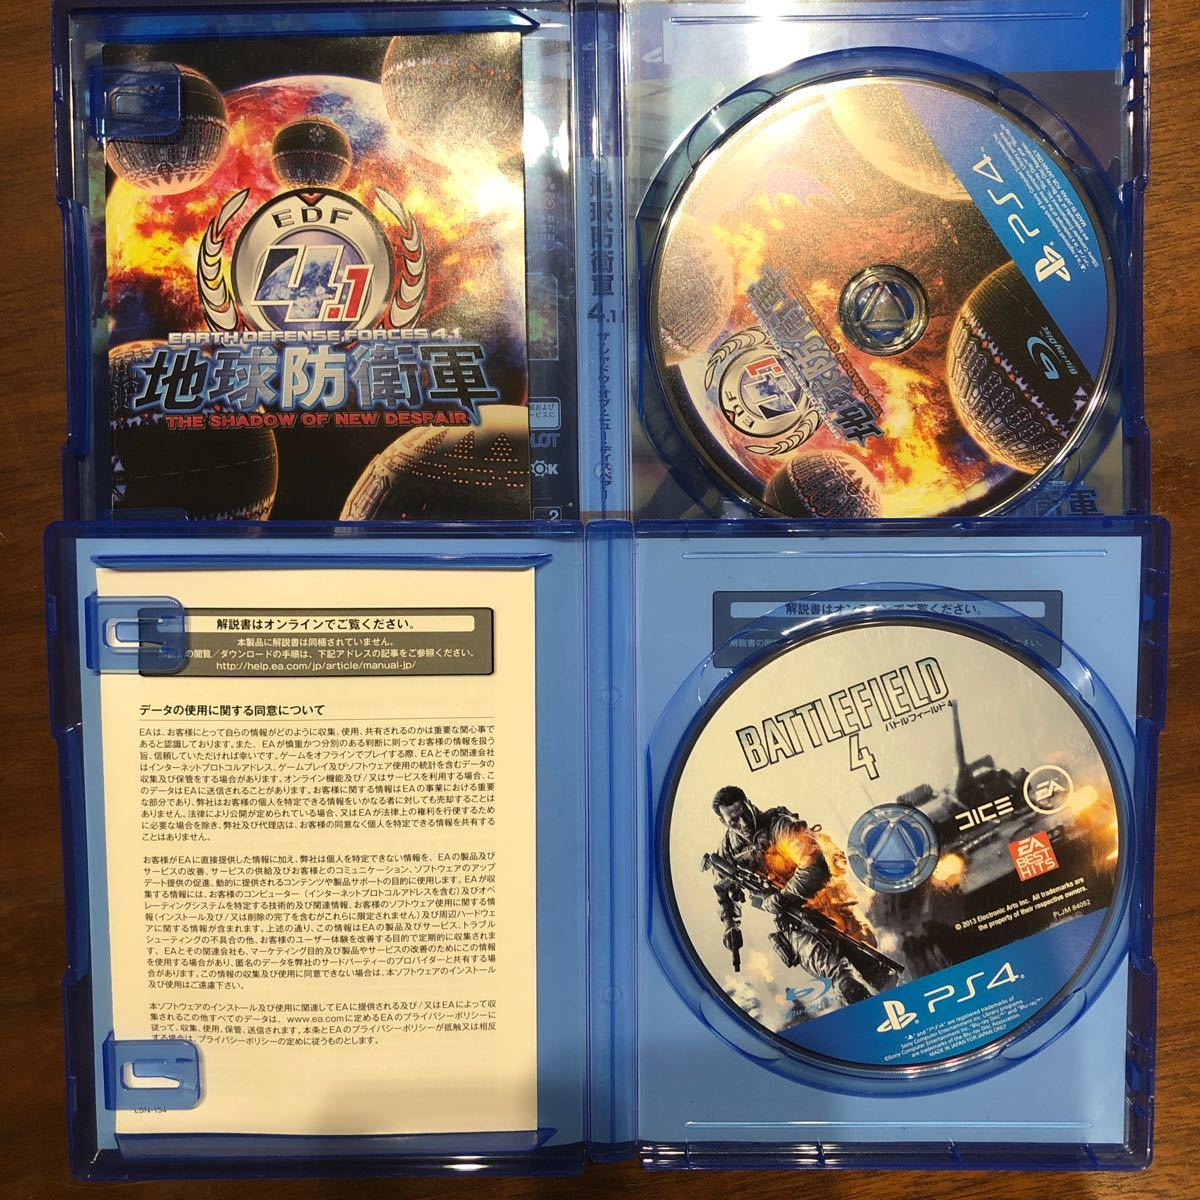 PS4ソフト 地球防衛軍4.1 バトルフィールド4 セット まとめ ゲームソフト